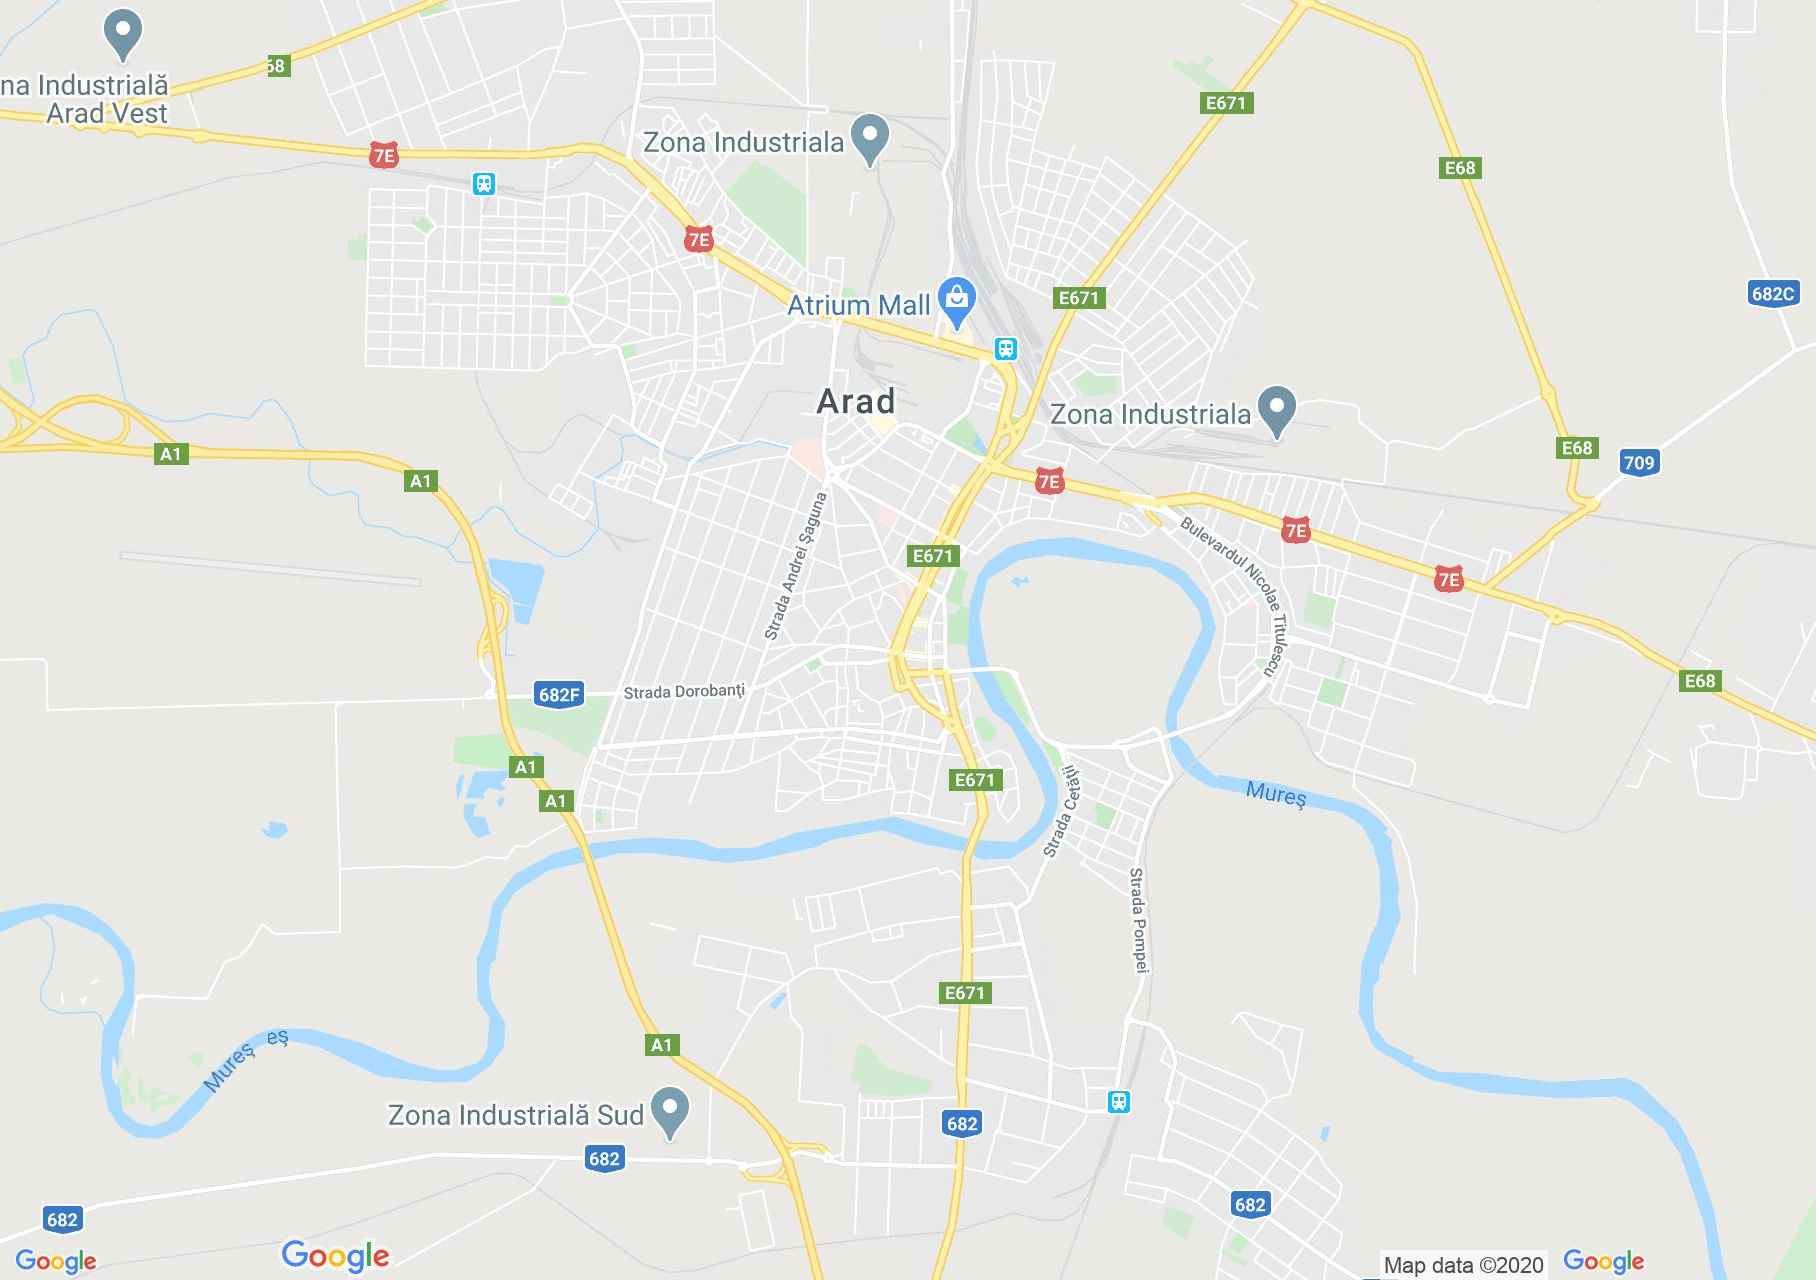 Arad, Interactive tourist map